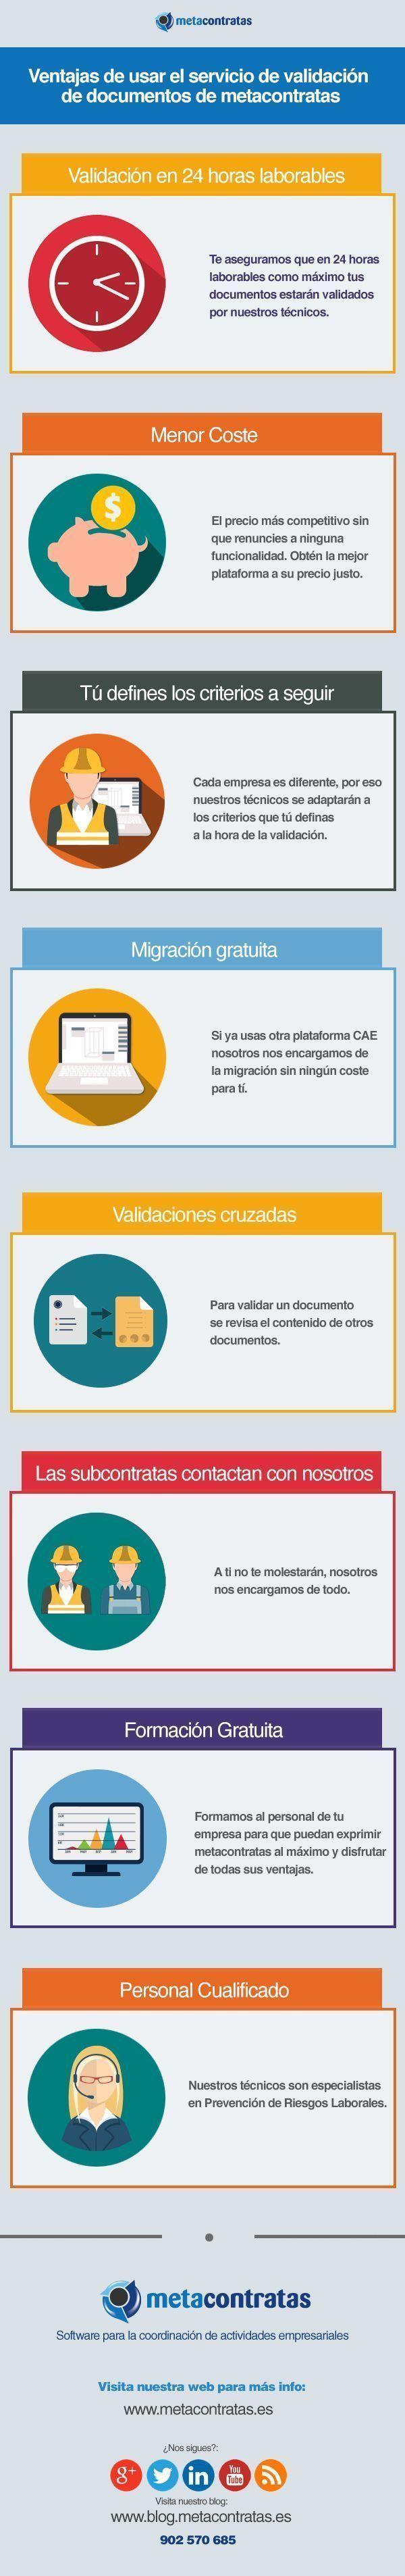 infografia_validacion_metacontratas_28PRL